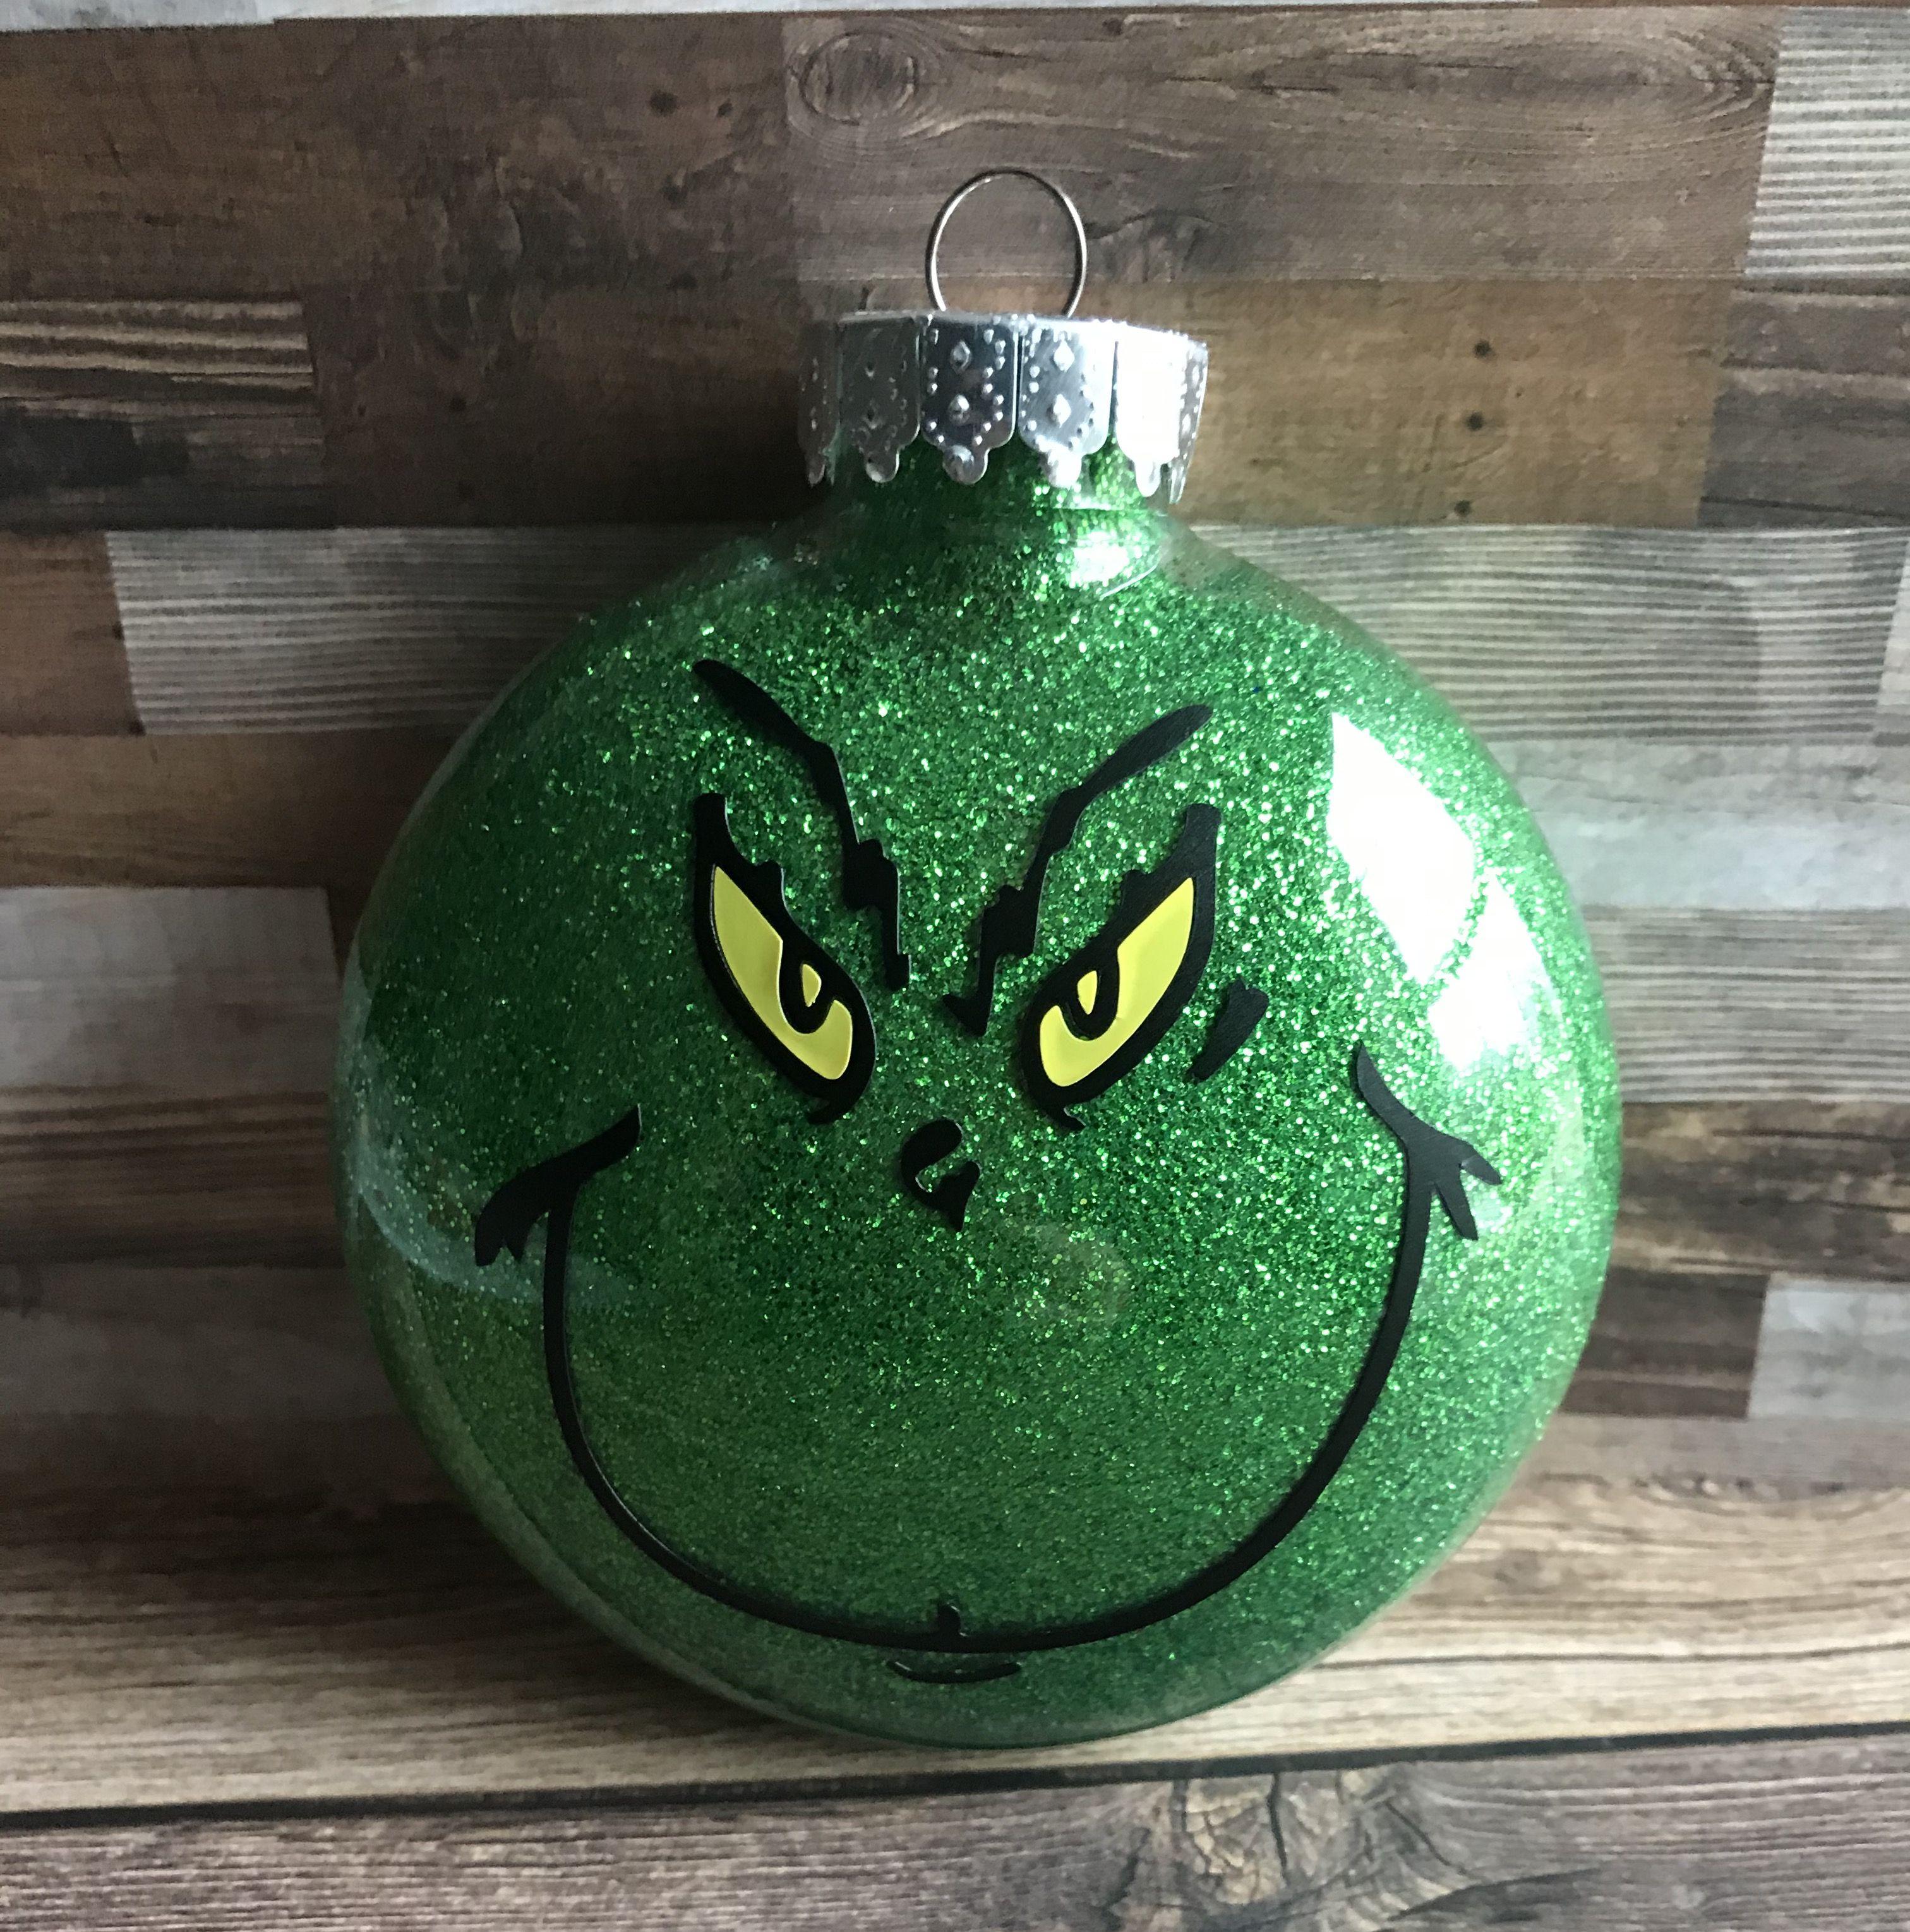 Grinch Glitter Ornament Ornaments Glitter Ornaments Christmas Ornaments